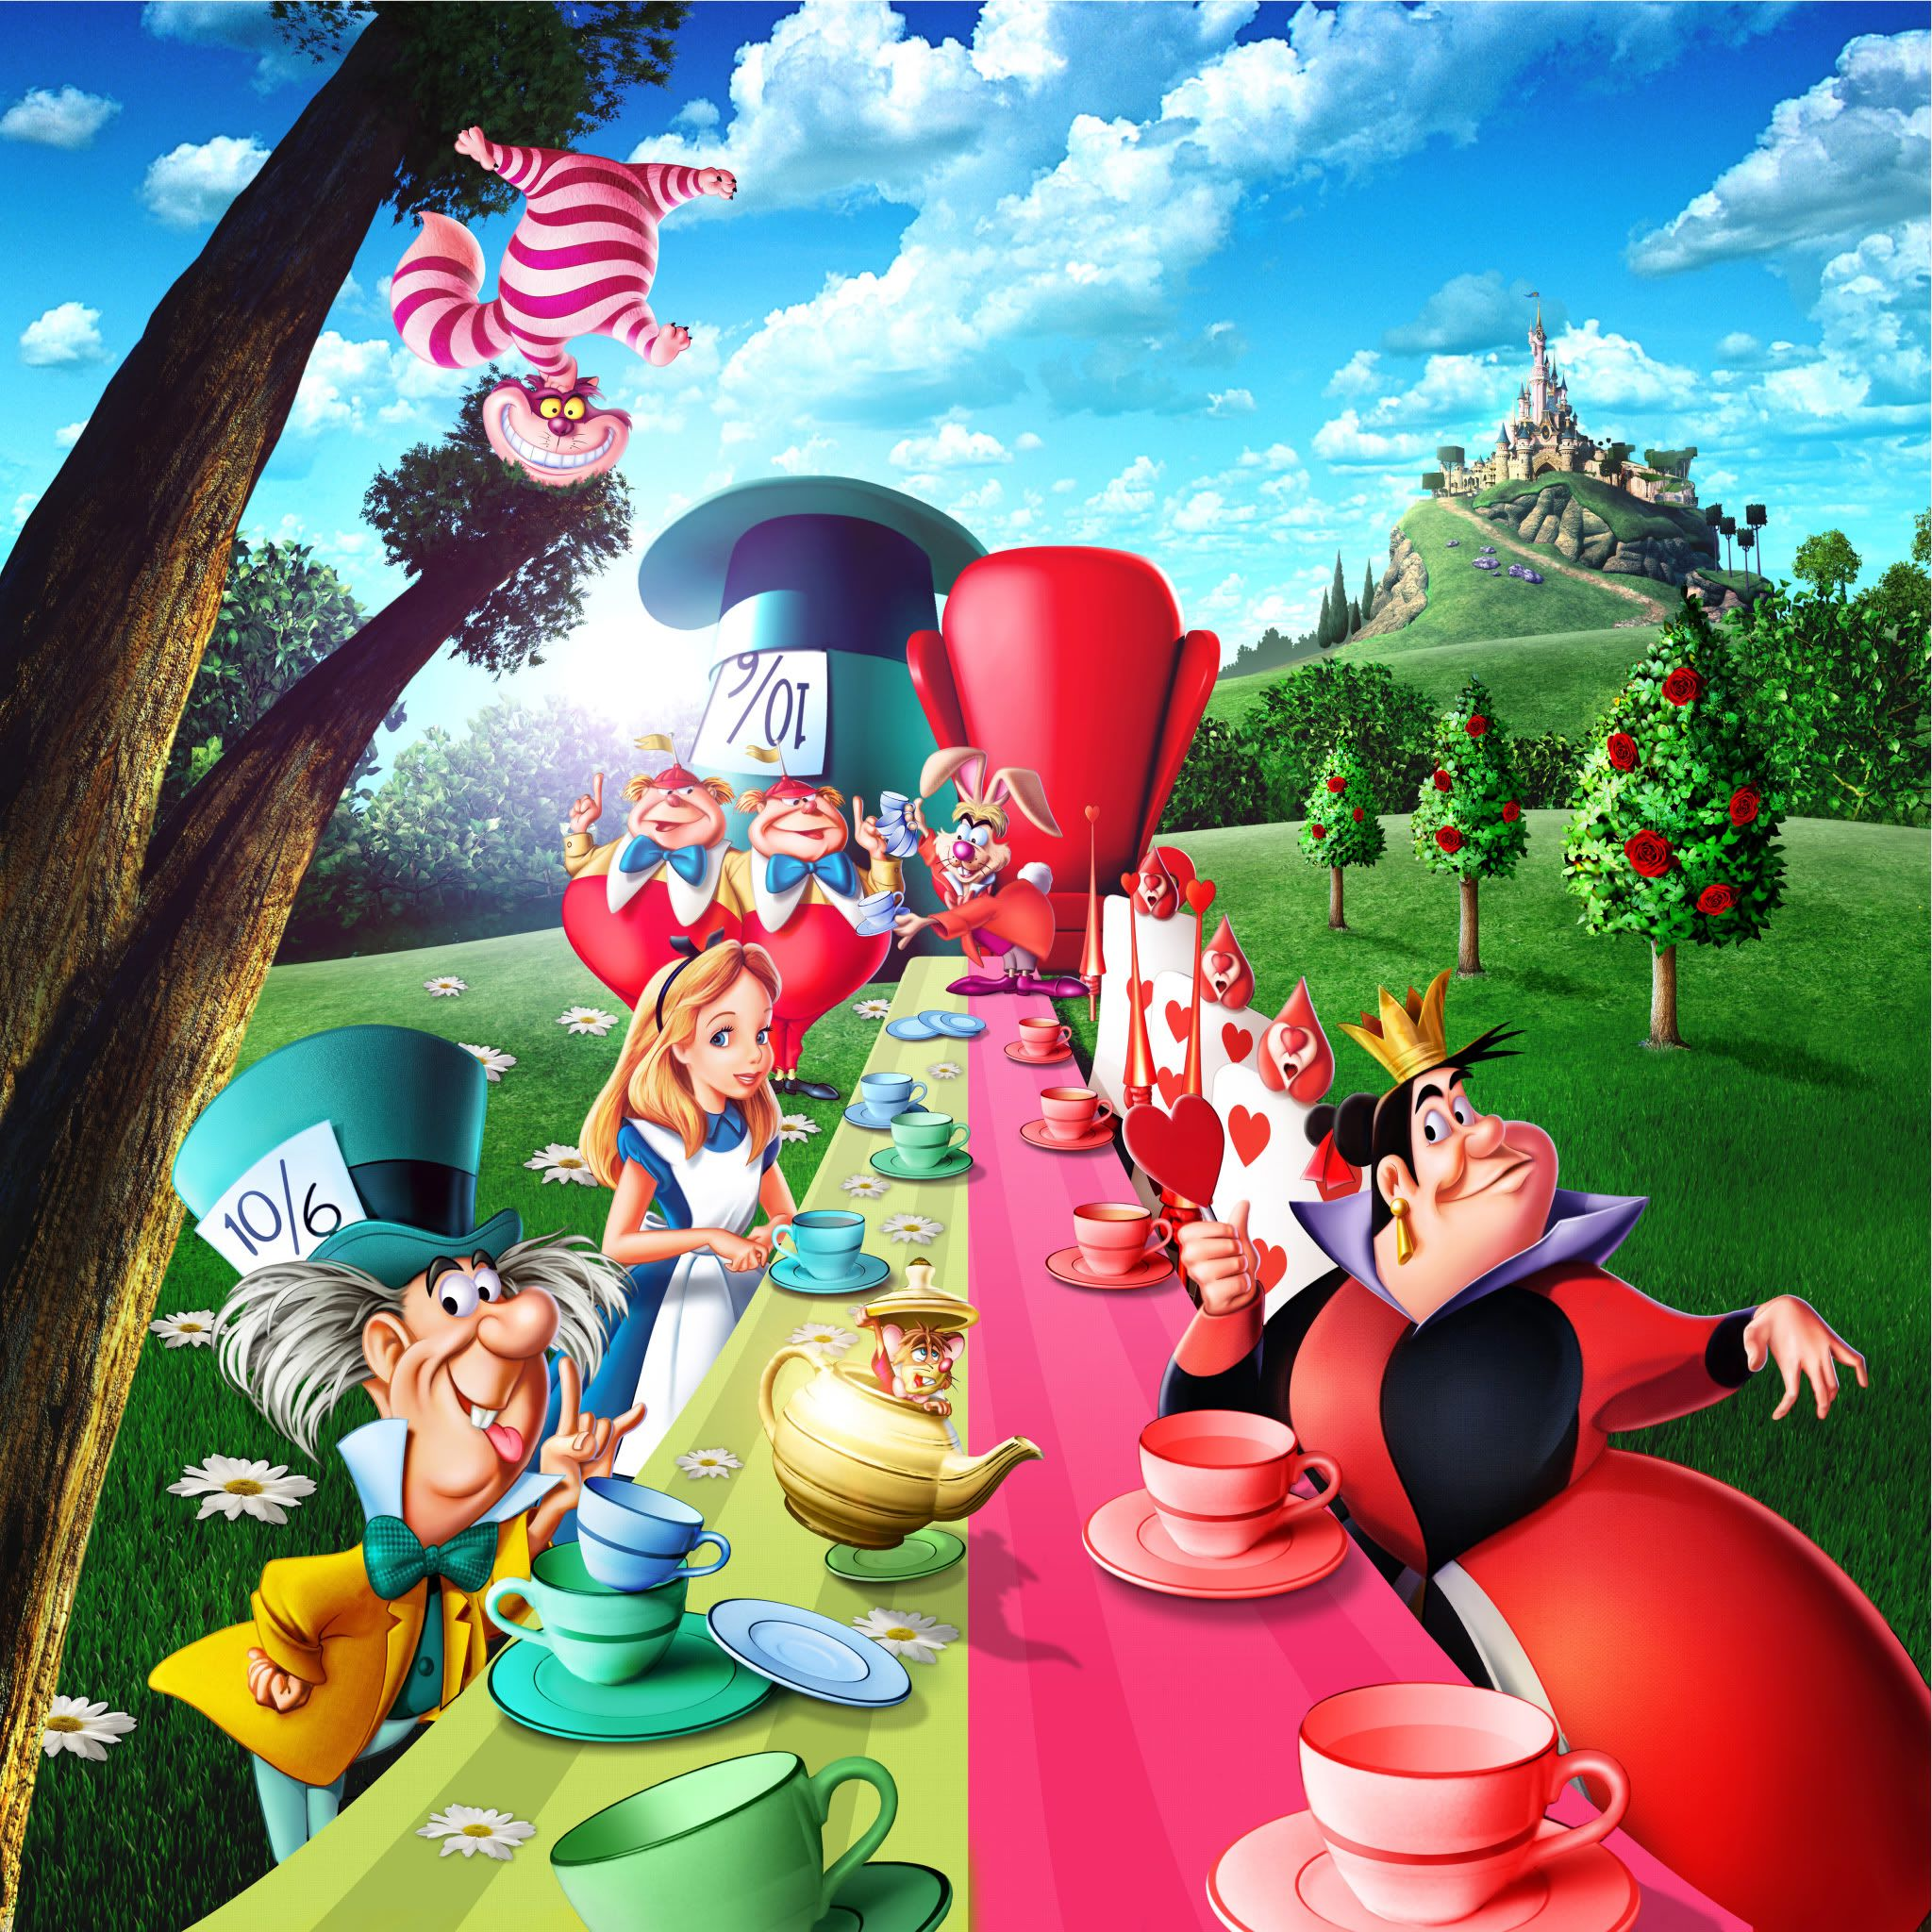 Alice In Wonderland Disney Characters: Disney